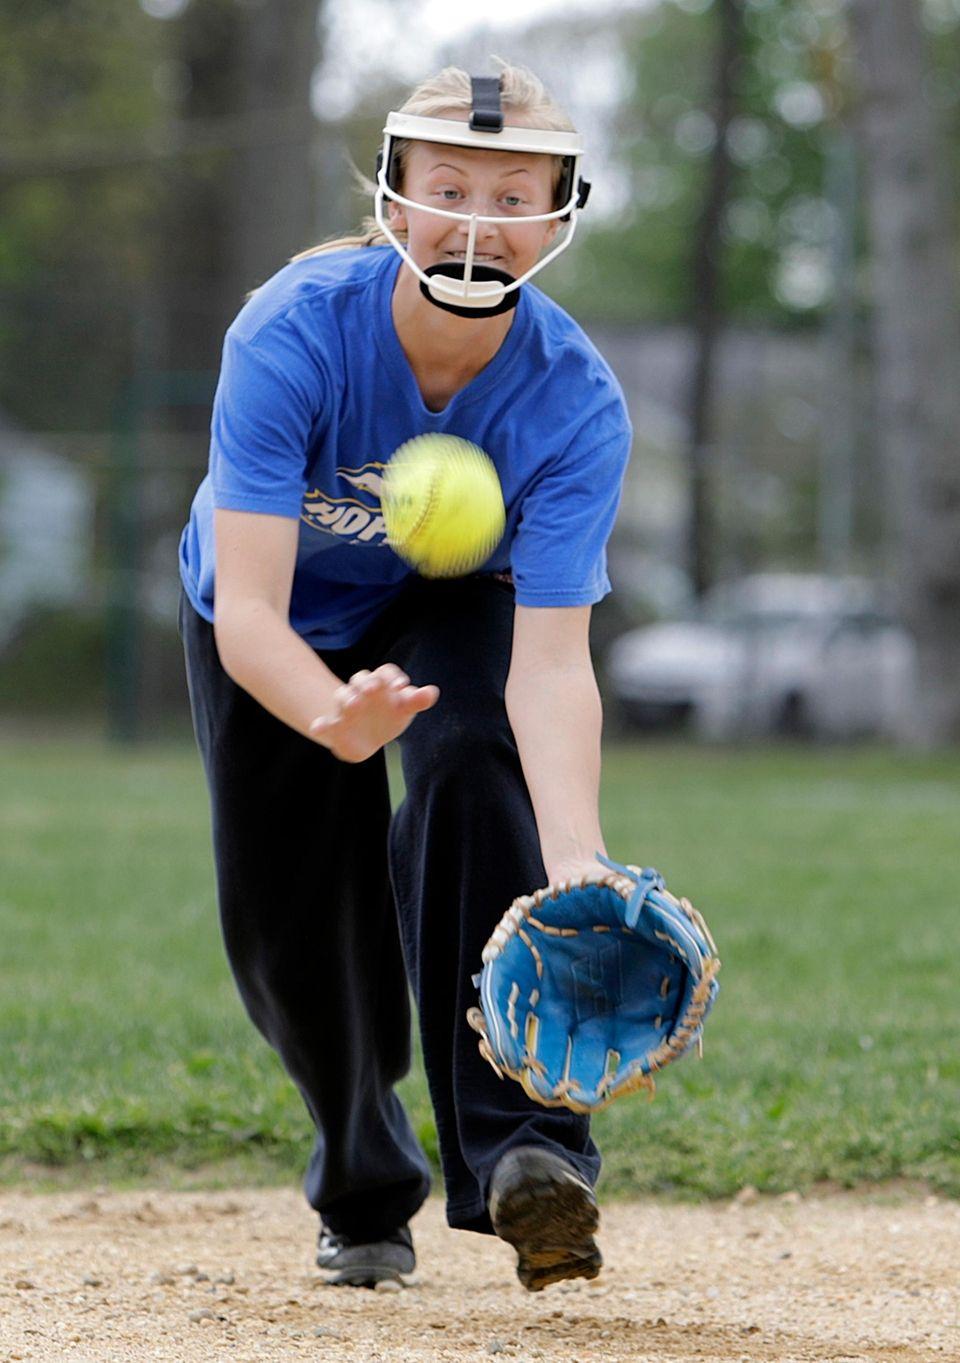 Islip second baseman Giana Edwards, who wears a